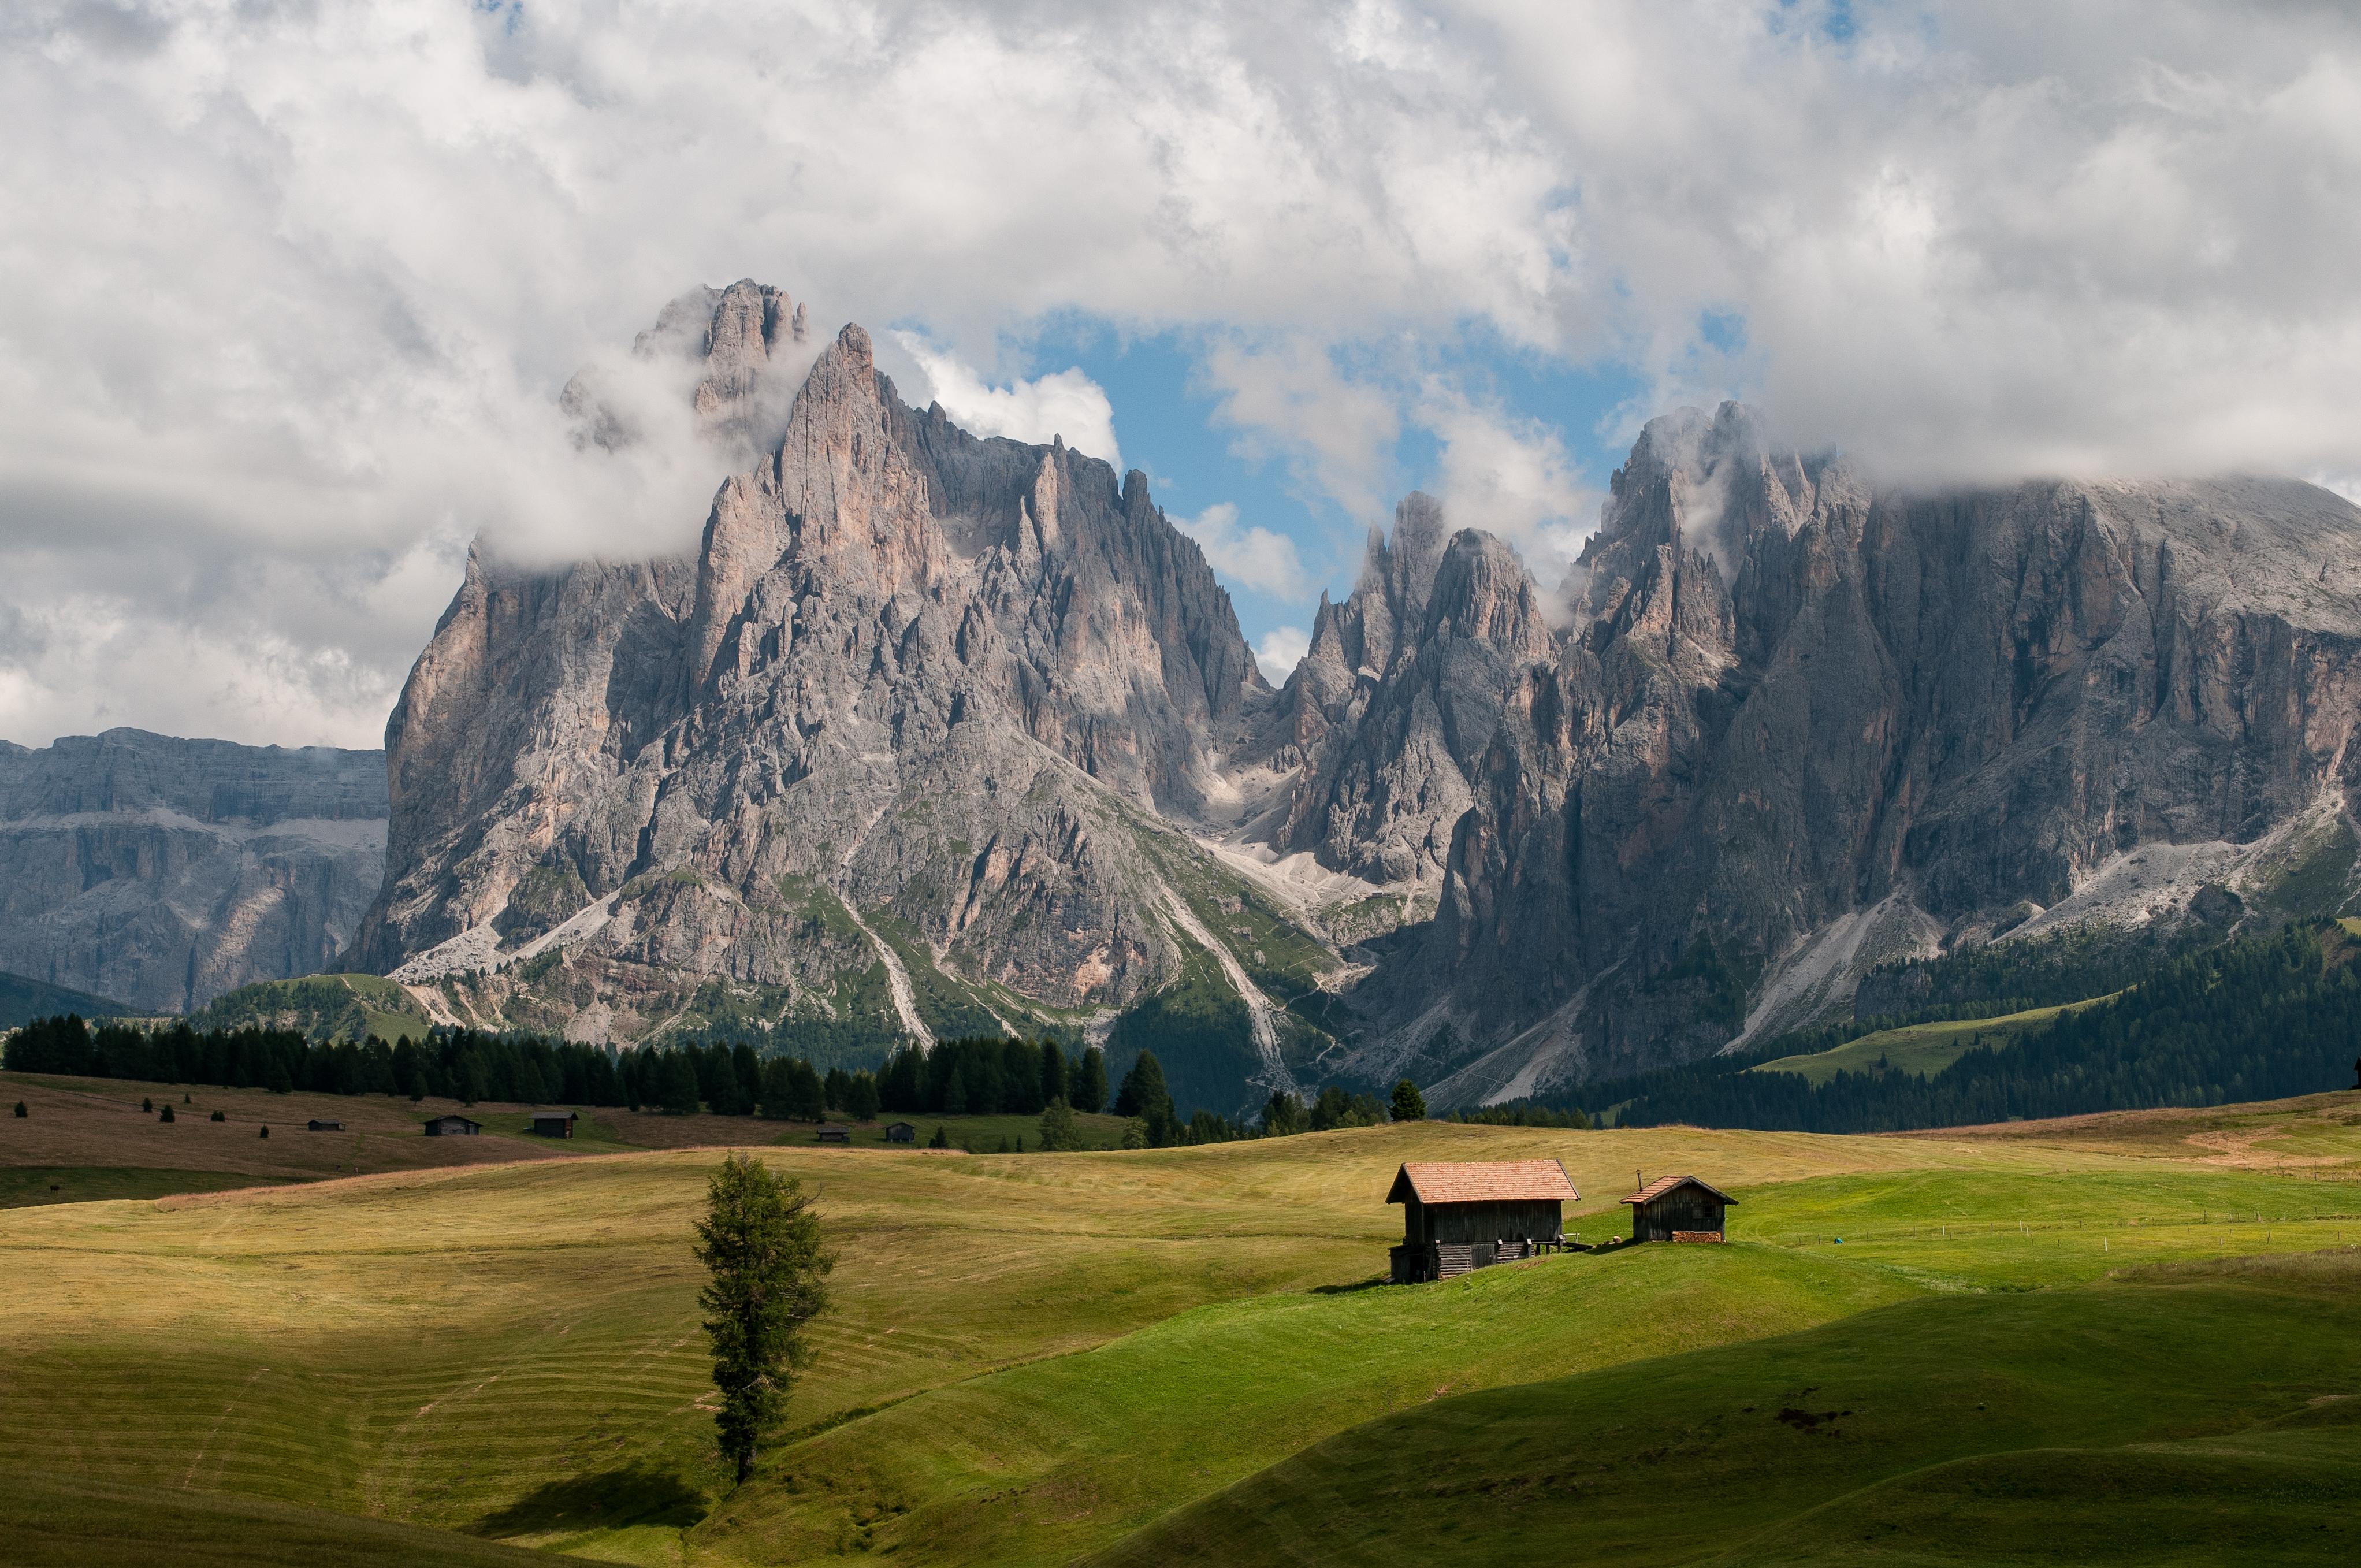 Dolomiti - Sasso Lungo  Sasso Piatto_7826976274_o